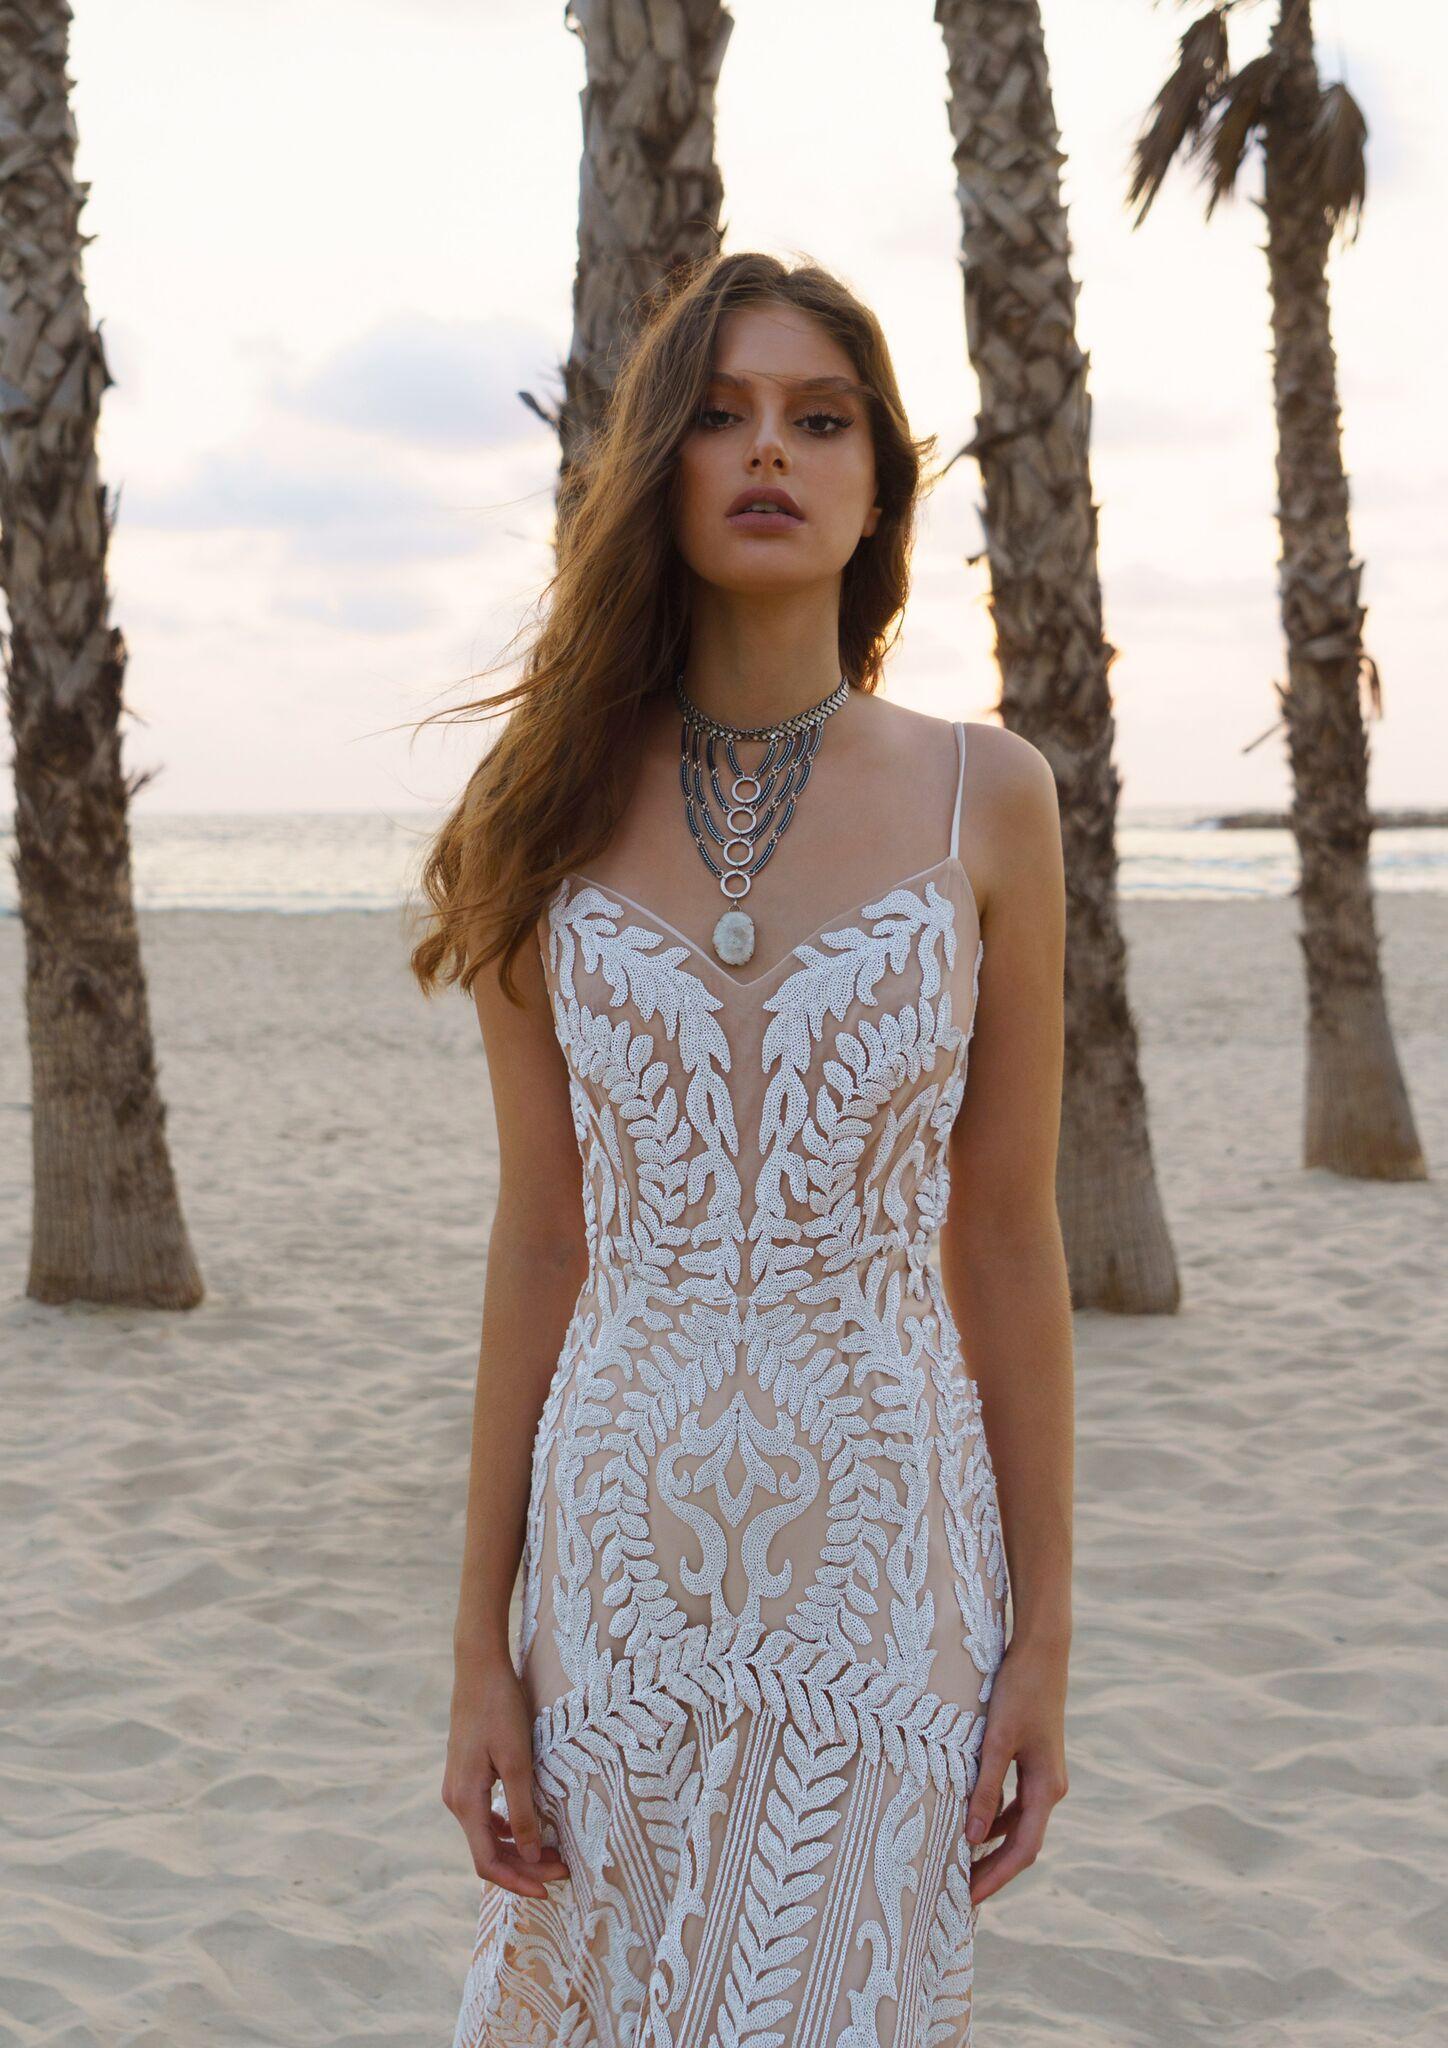 dca6391e07bdb Rish Bridal | Gaia | Sundance Collection | Effortlessly Sexy Boho Wedding  Dresses | Glam Boho | Boho Bride | Destination Weddings | Boho Weddings |  Shop the ...